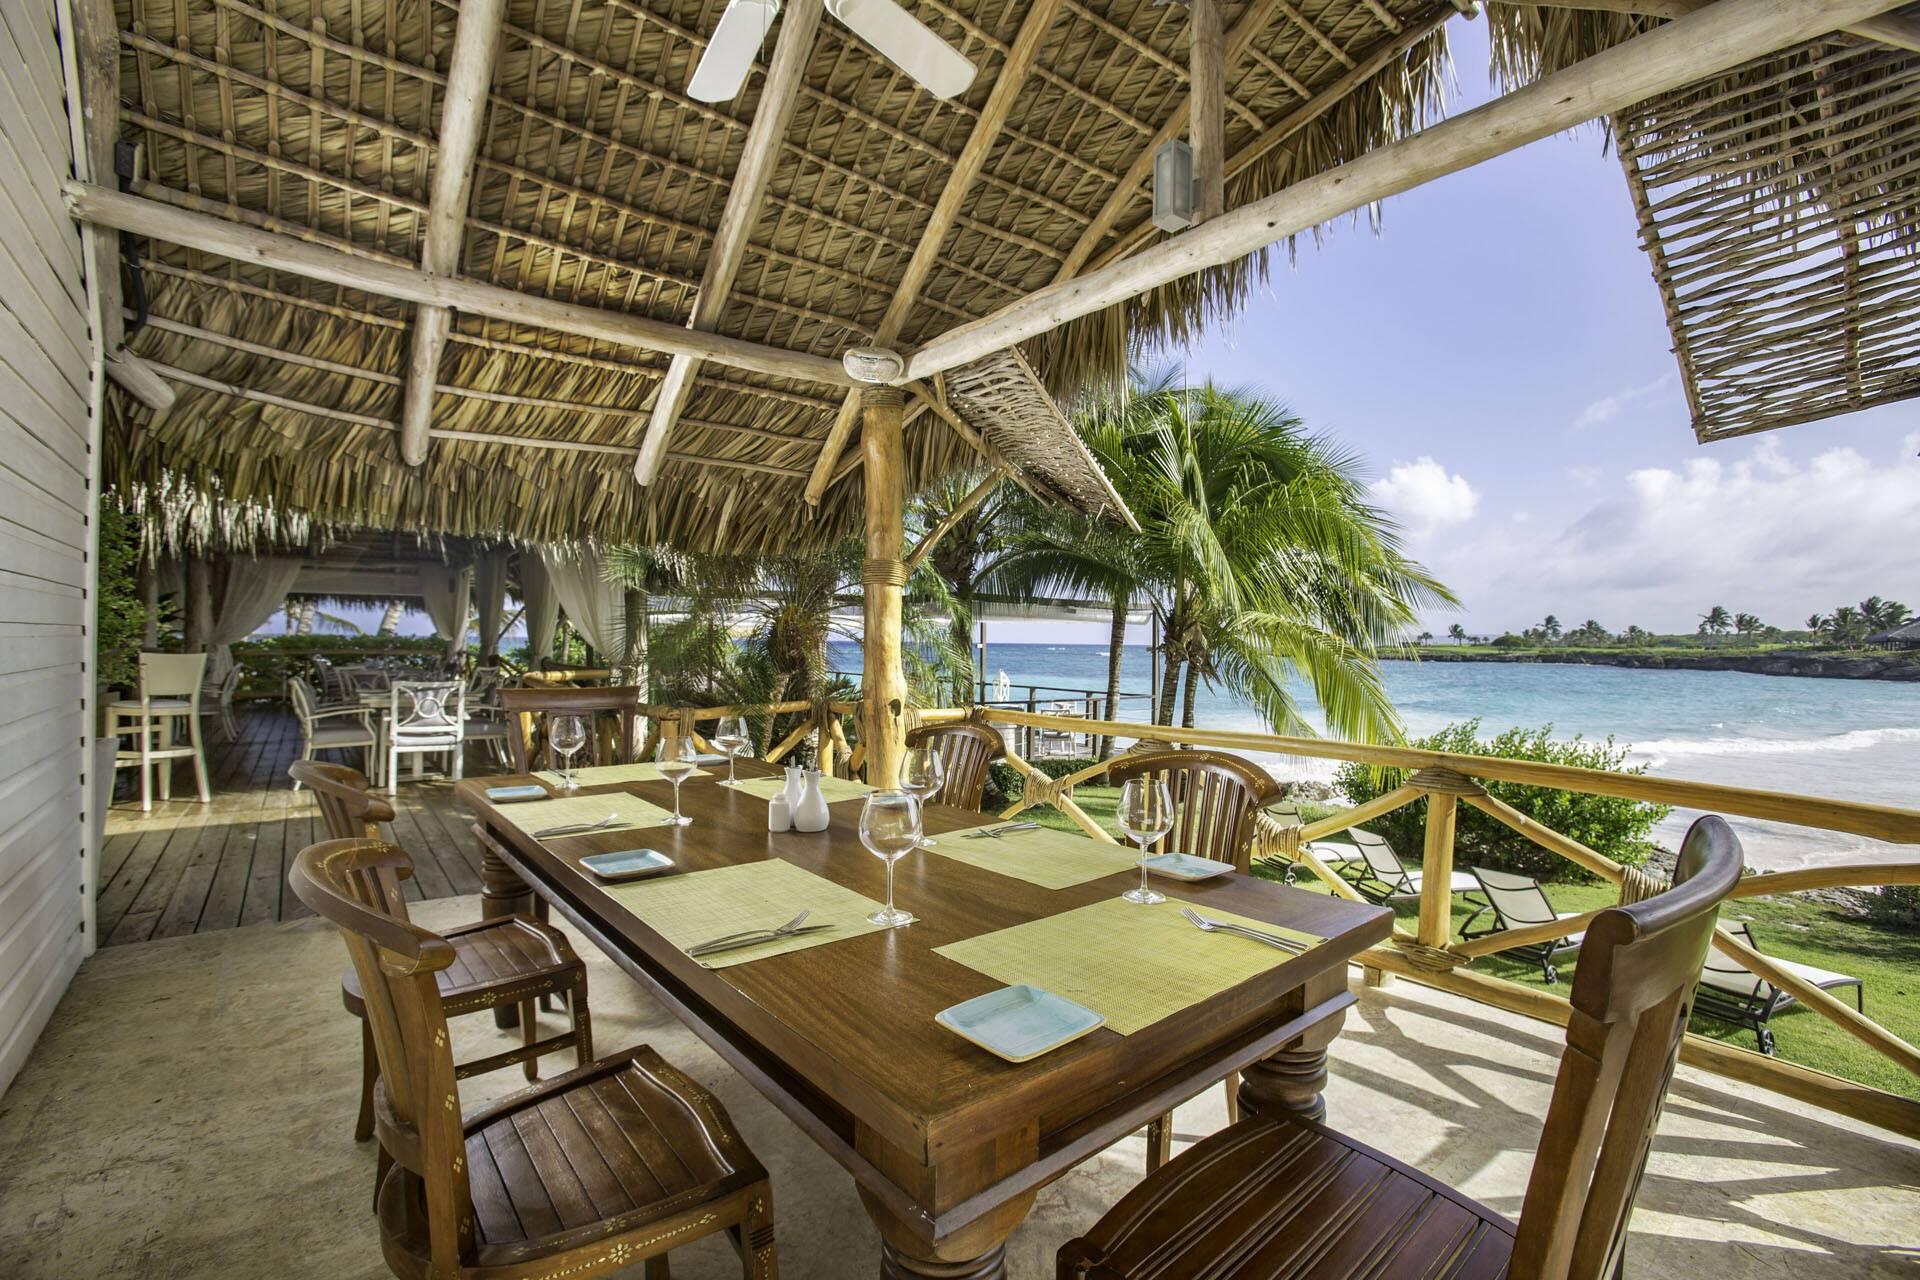 Eden Roc Cap Cana Punta Cana Rep Republicaine Restaurant